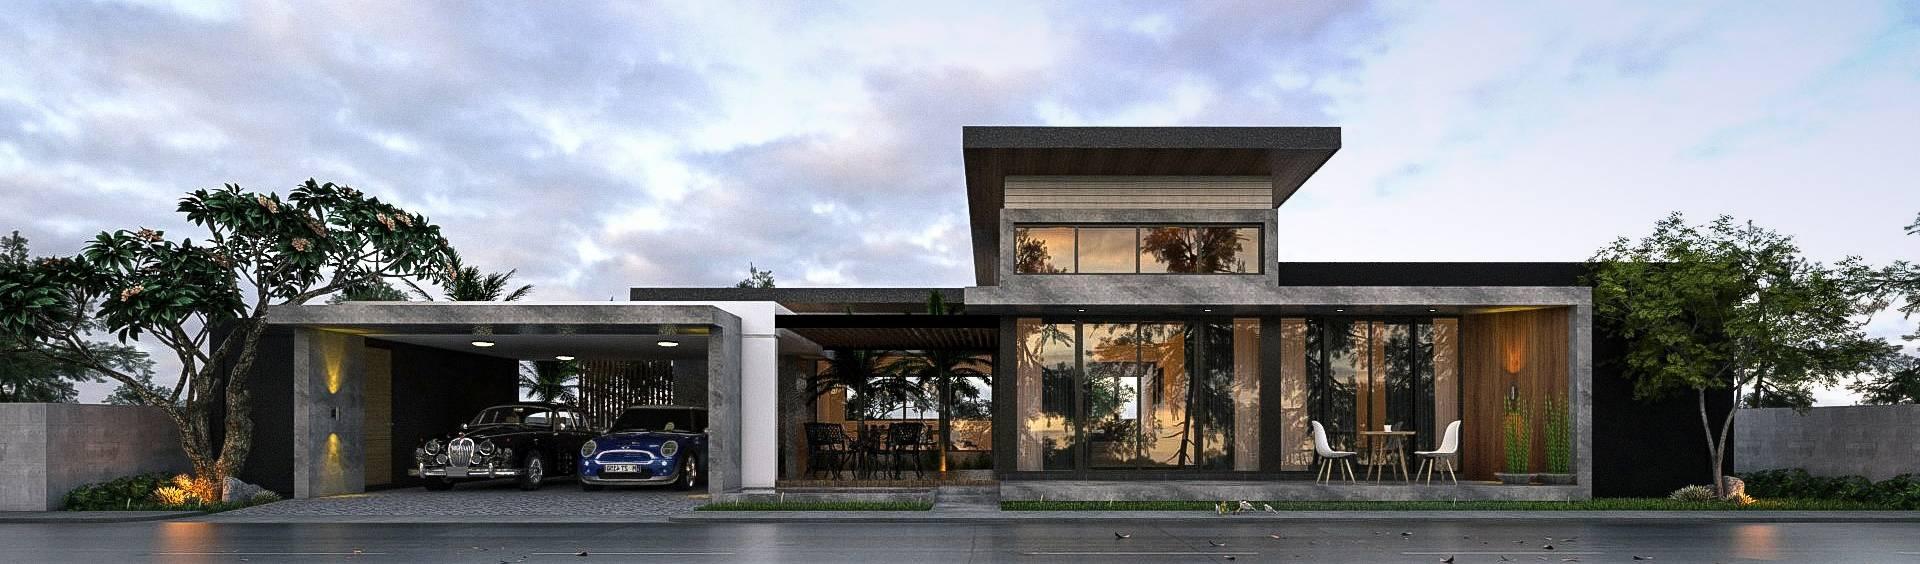 Ultimate Architect รับออกแบบบ้าน